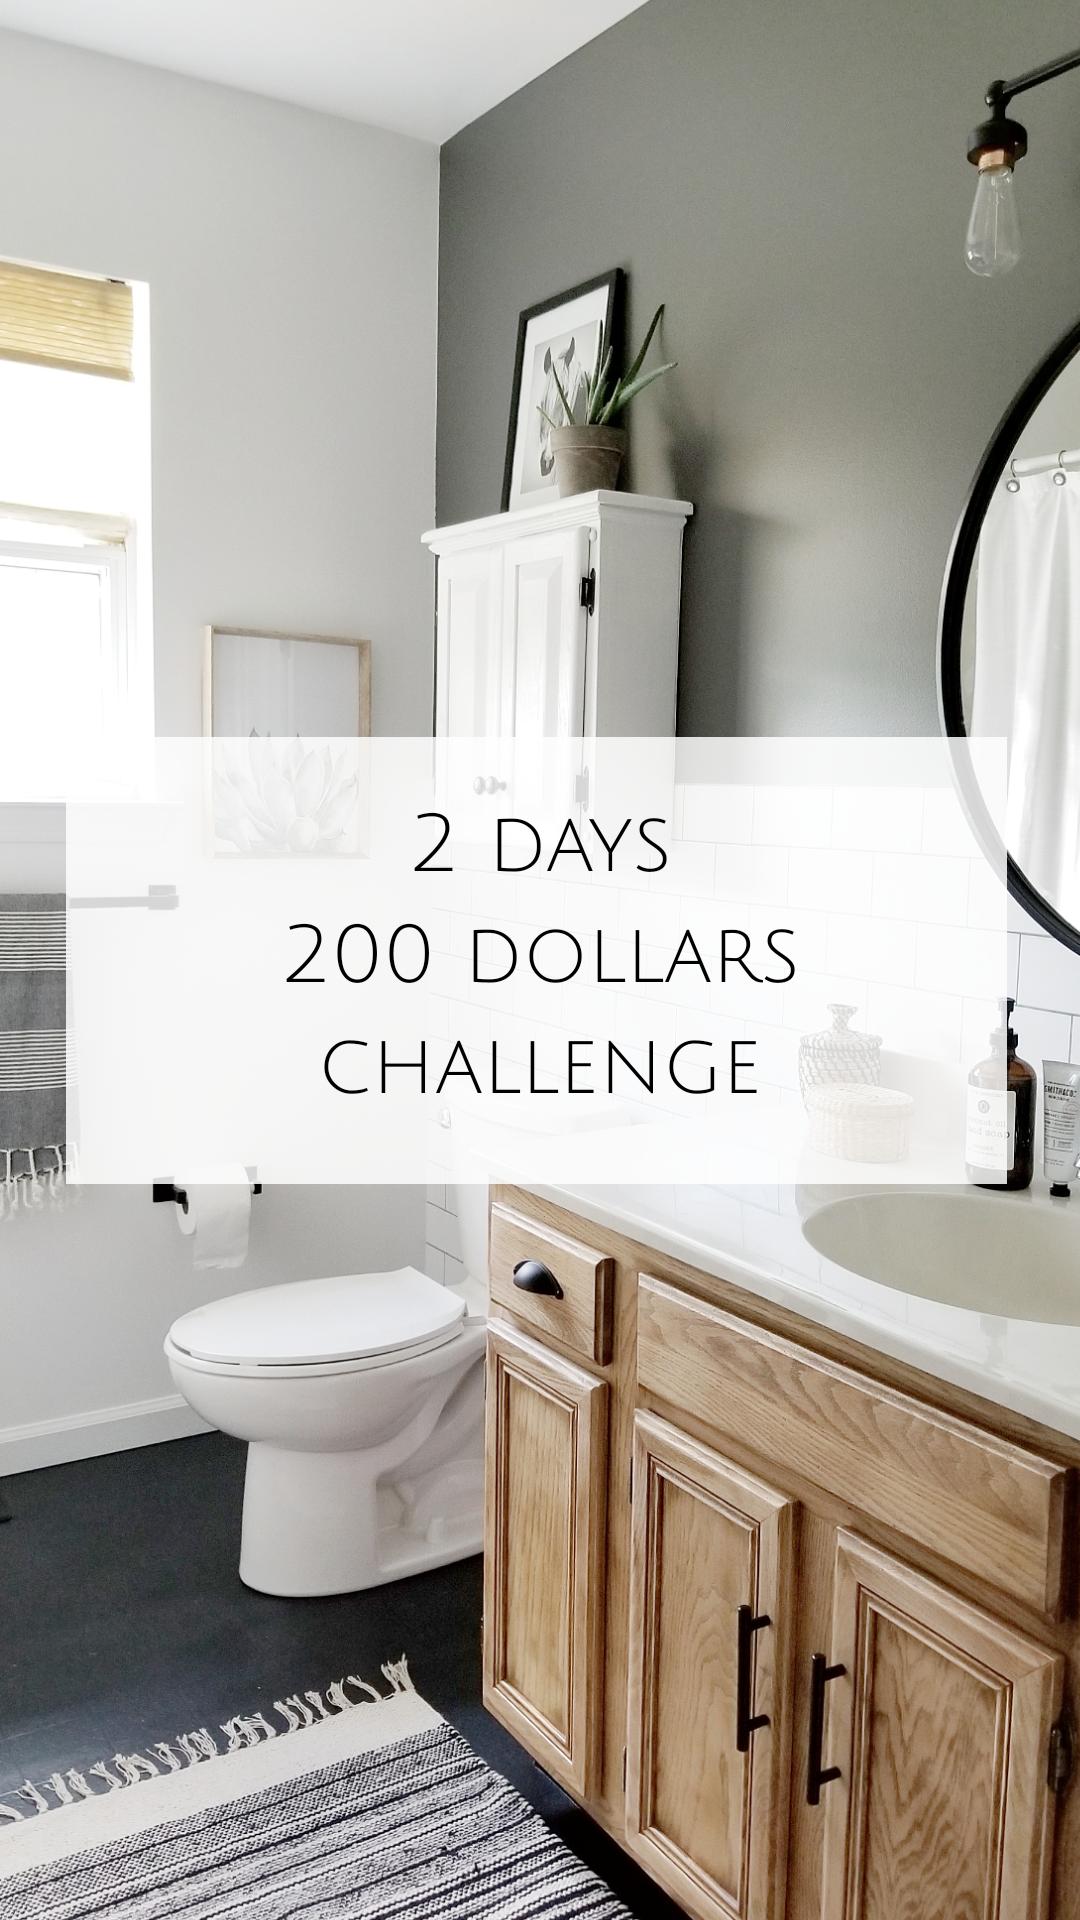 My 2 Days 200 Dollars Challenge Bathroommakeovers Quick And Easy Budget Bathroom Makeover Budget Bathroom Remodel Diy Bathroom Makeover Diy Bathroom Remodel